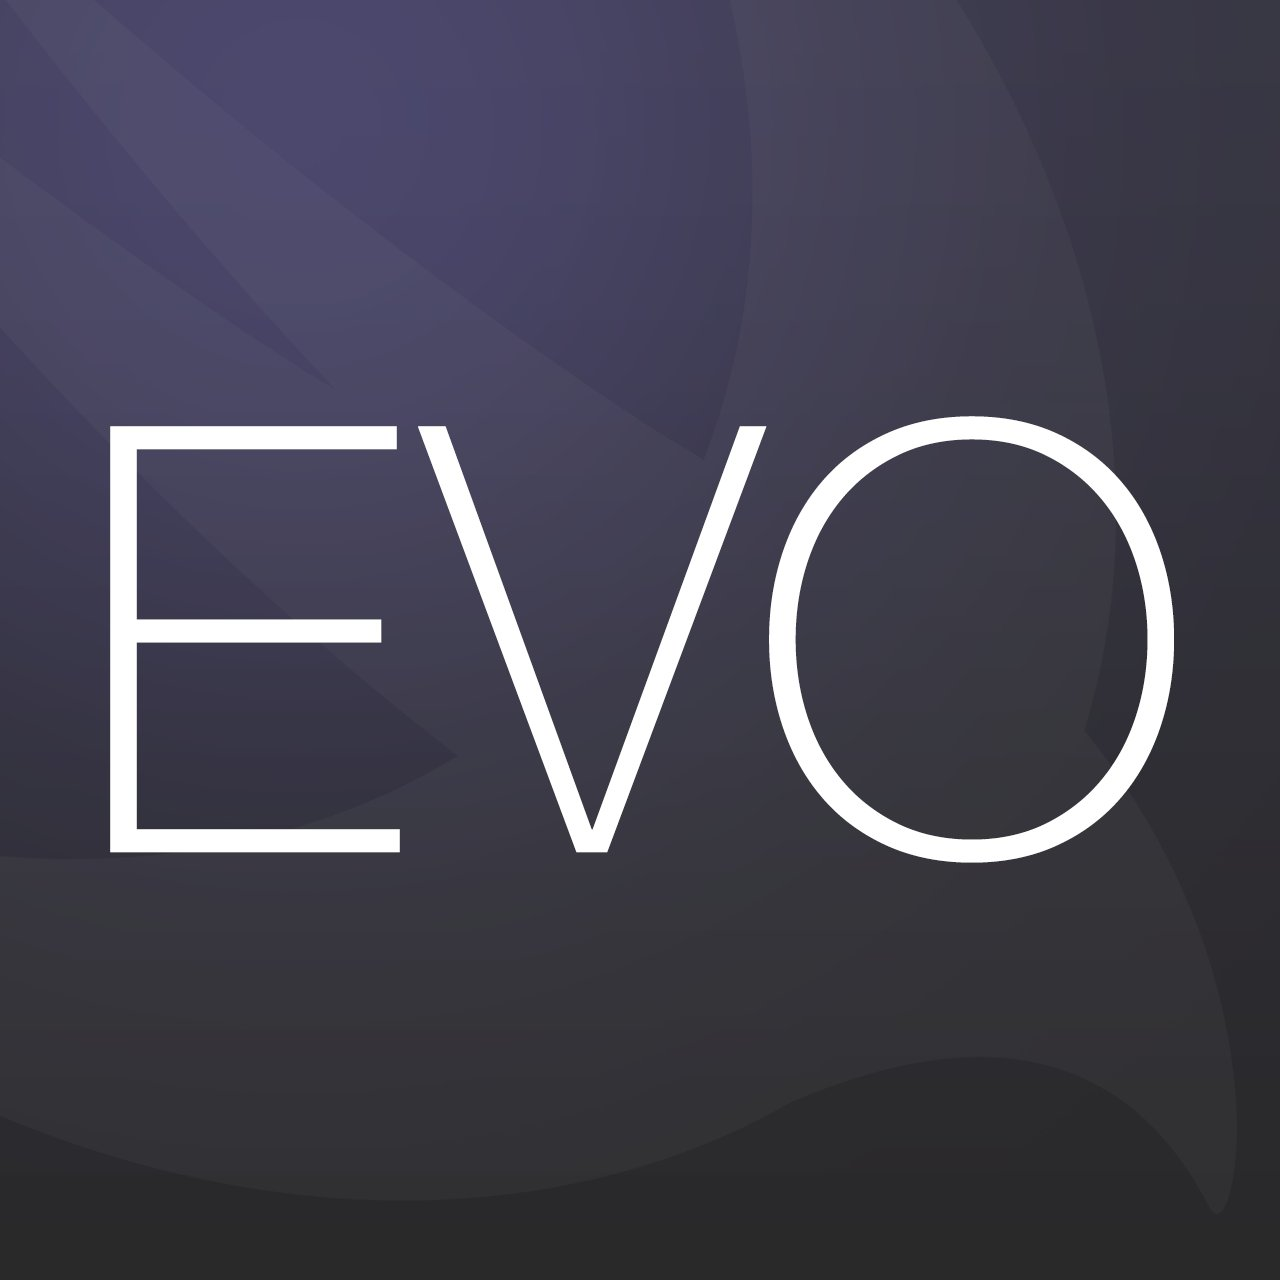 EVO - Evolution Swift